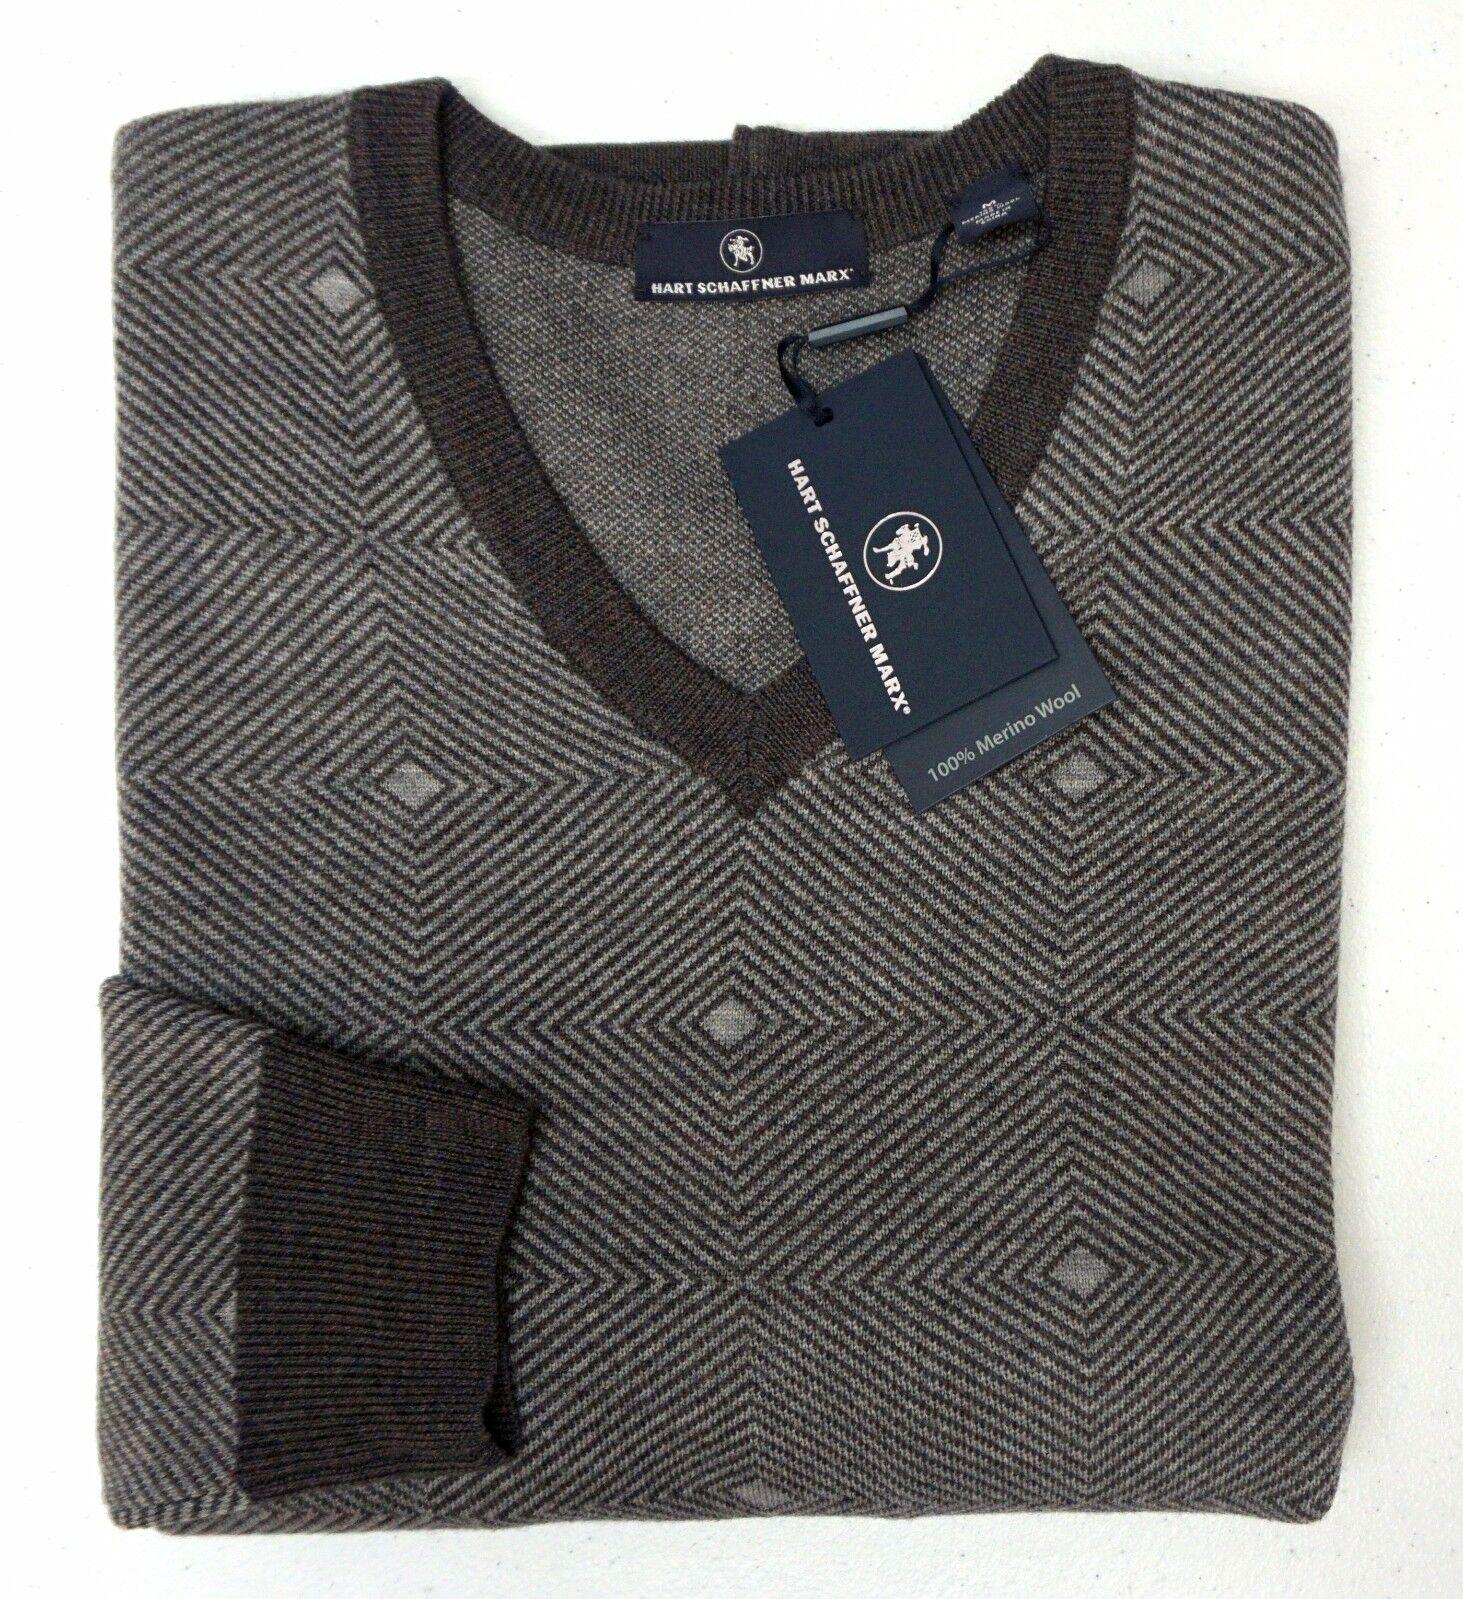 NWT  Hart Schaffner Marx LS Sweater Mens Size XL 100% Merino Wool Brown NEW